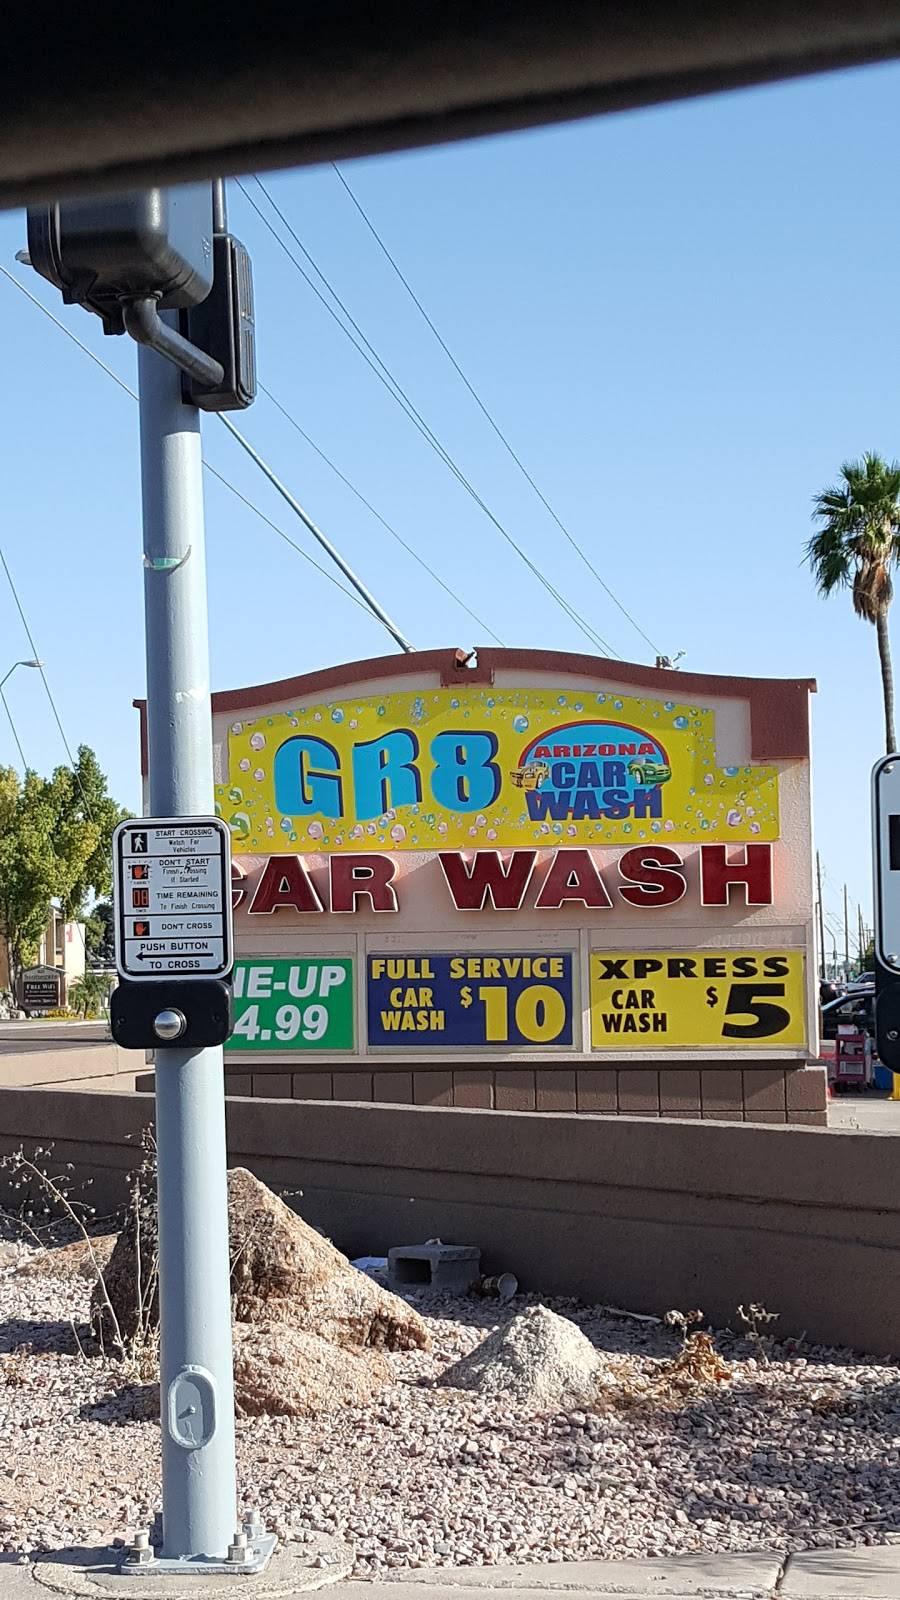 Raceway Express Car Wash - car wash    Photo 9 of 10   Address: 808 S Alma School Rd, Mesa, AZ 85210, USA   Phone: (602) 900-1731